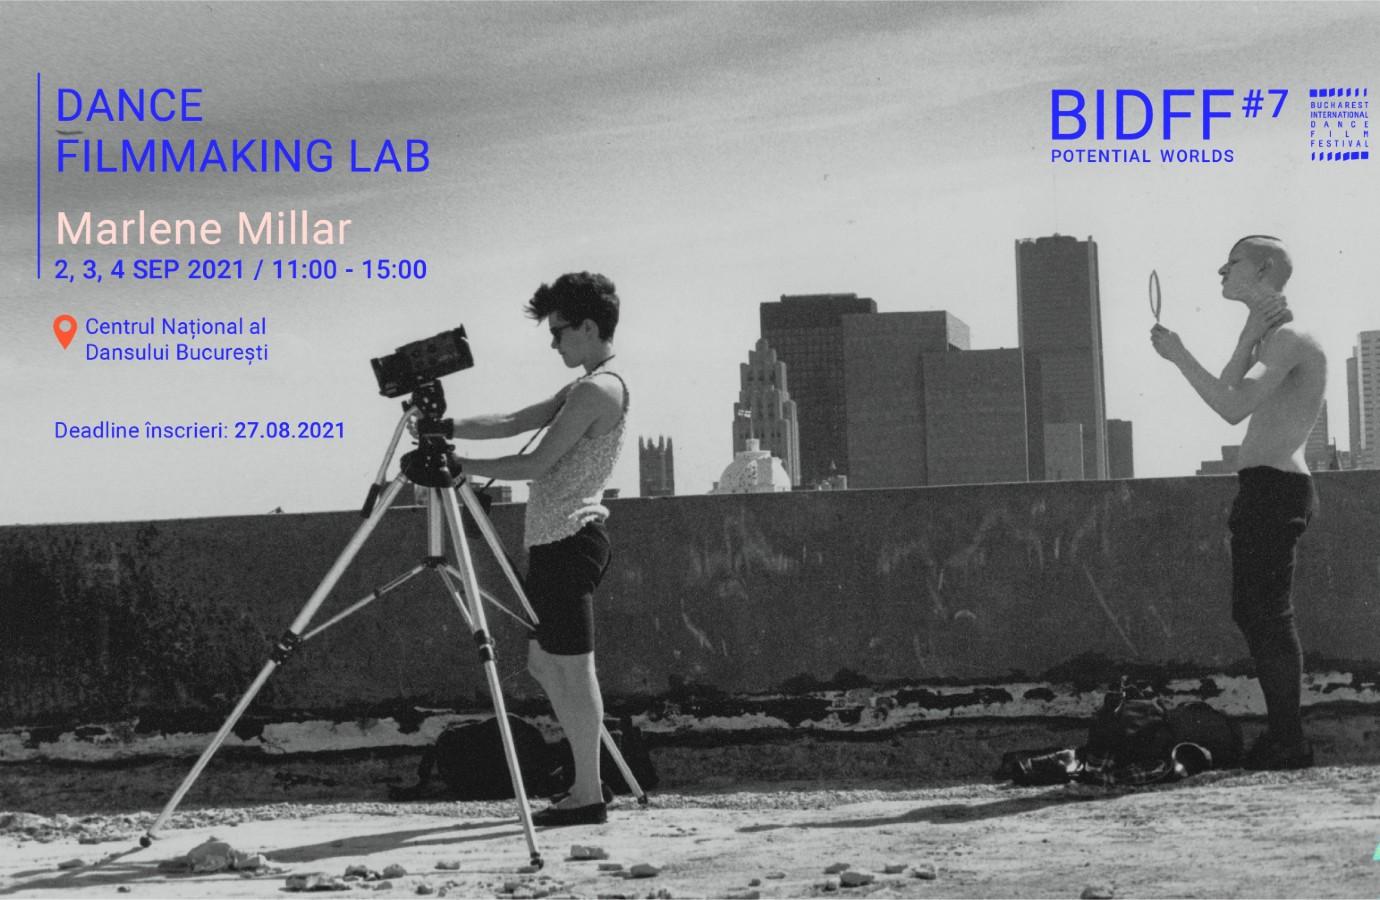 Dance Filmmaking Lab